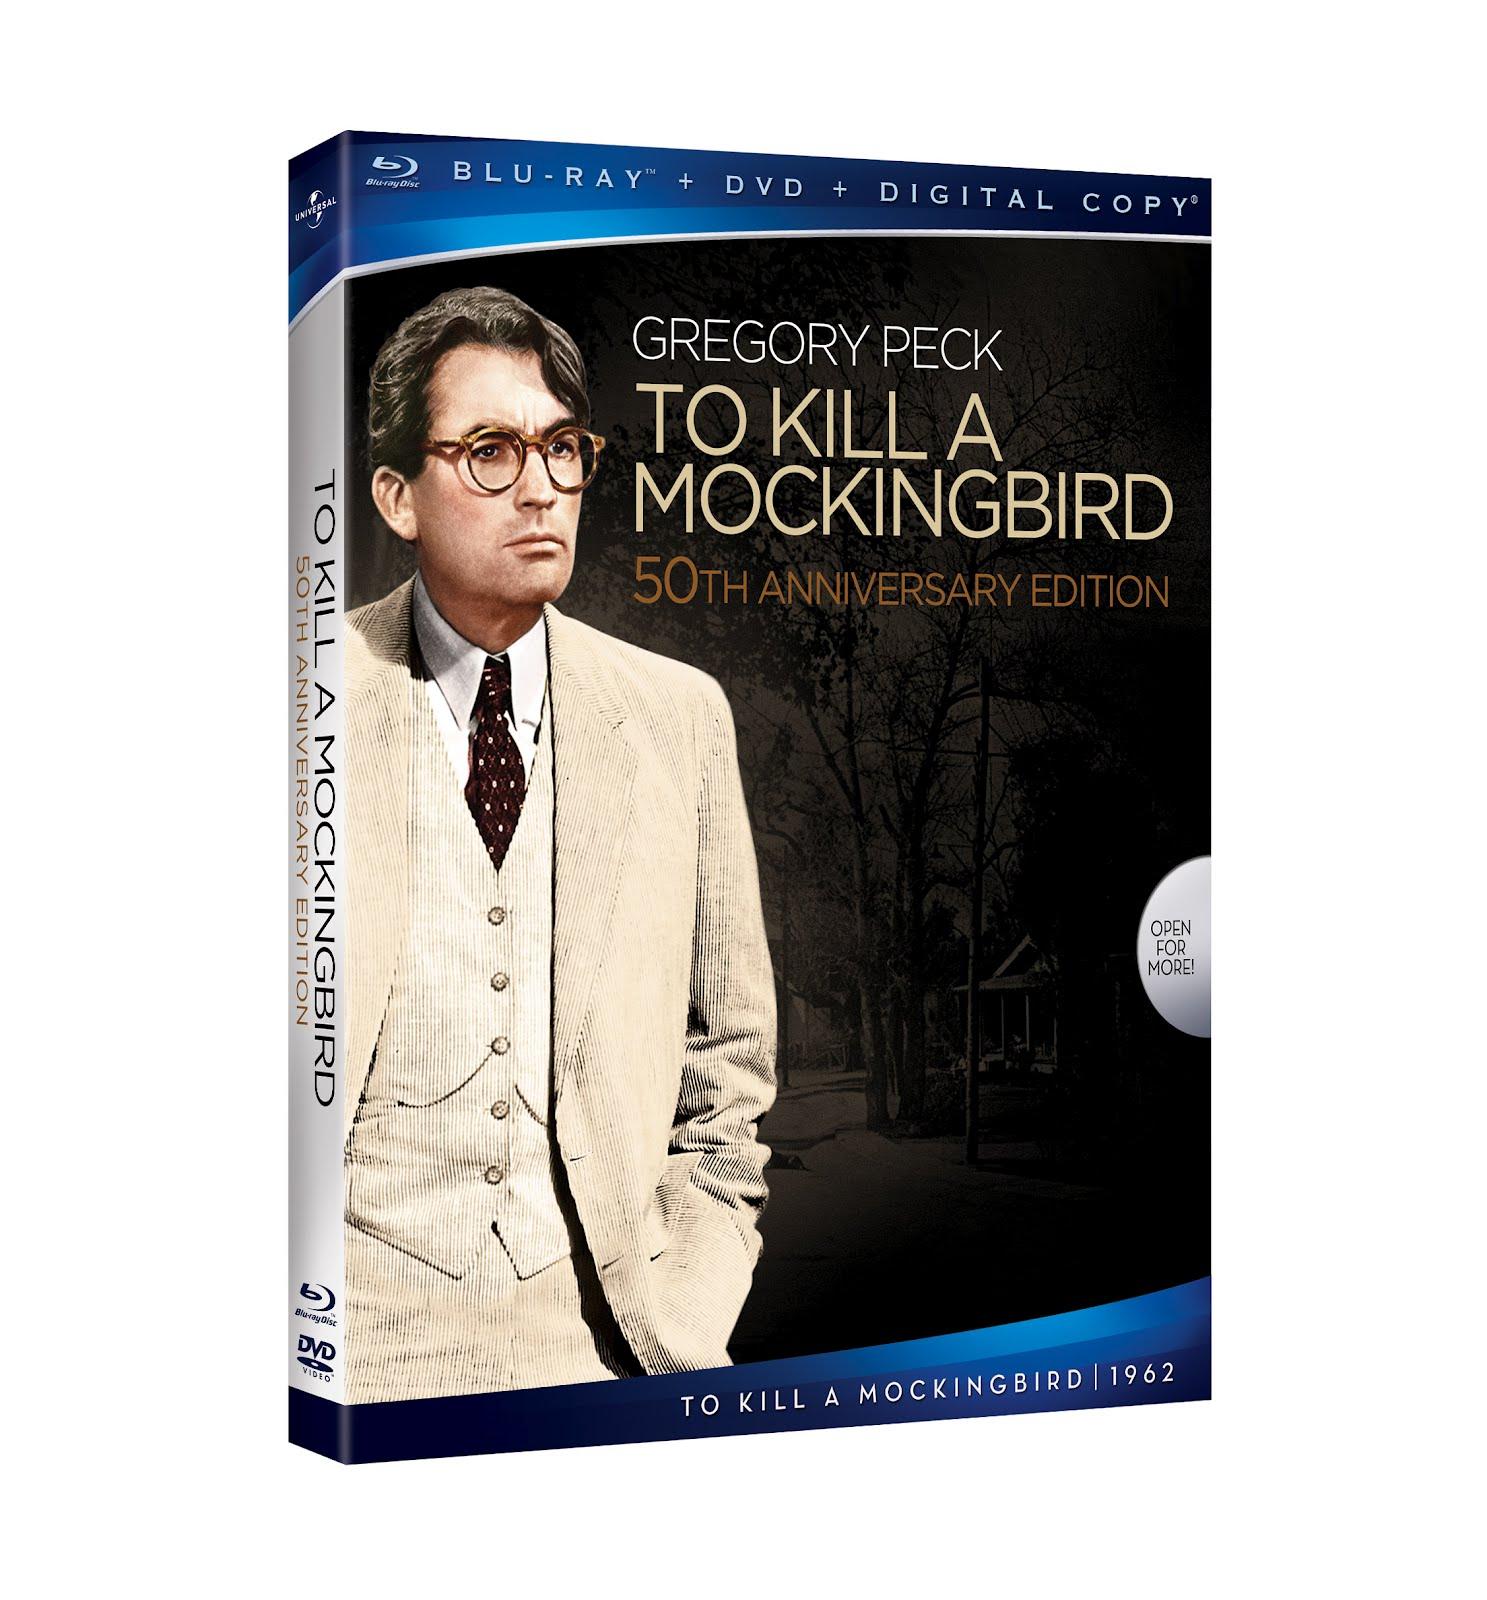 to kill a mockingbird movie review